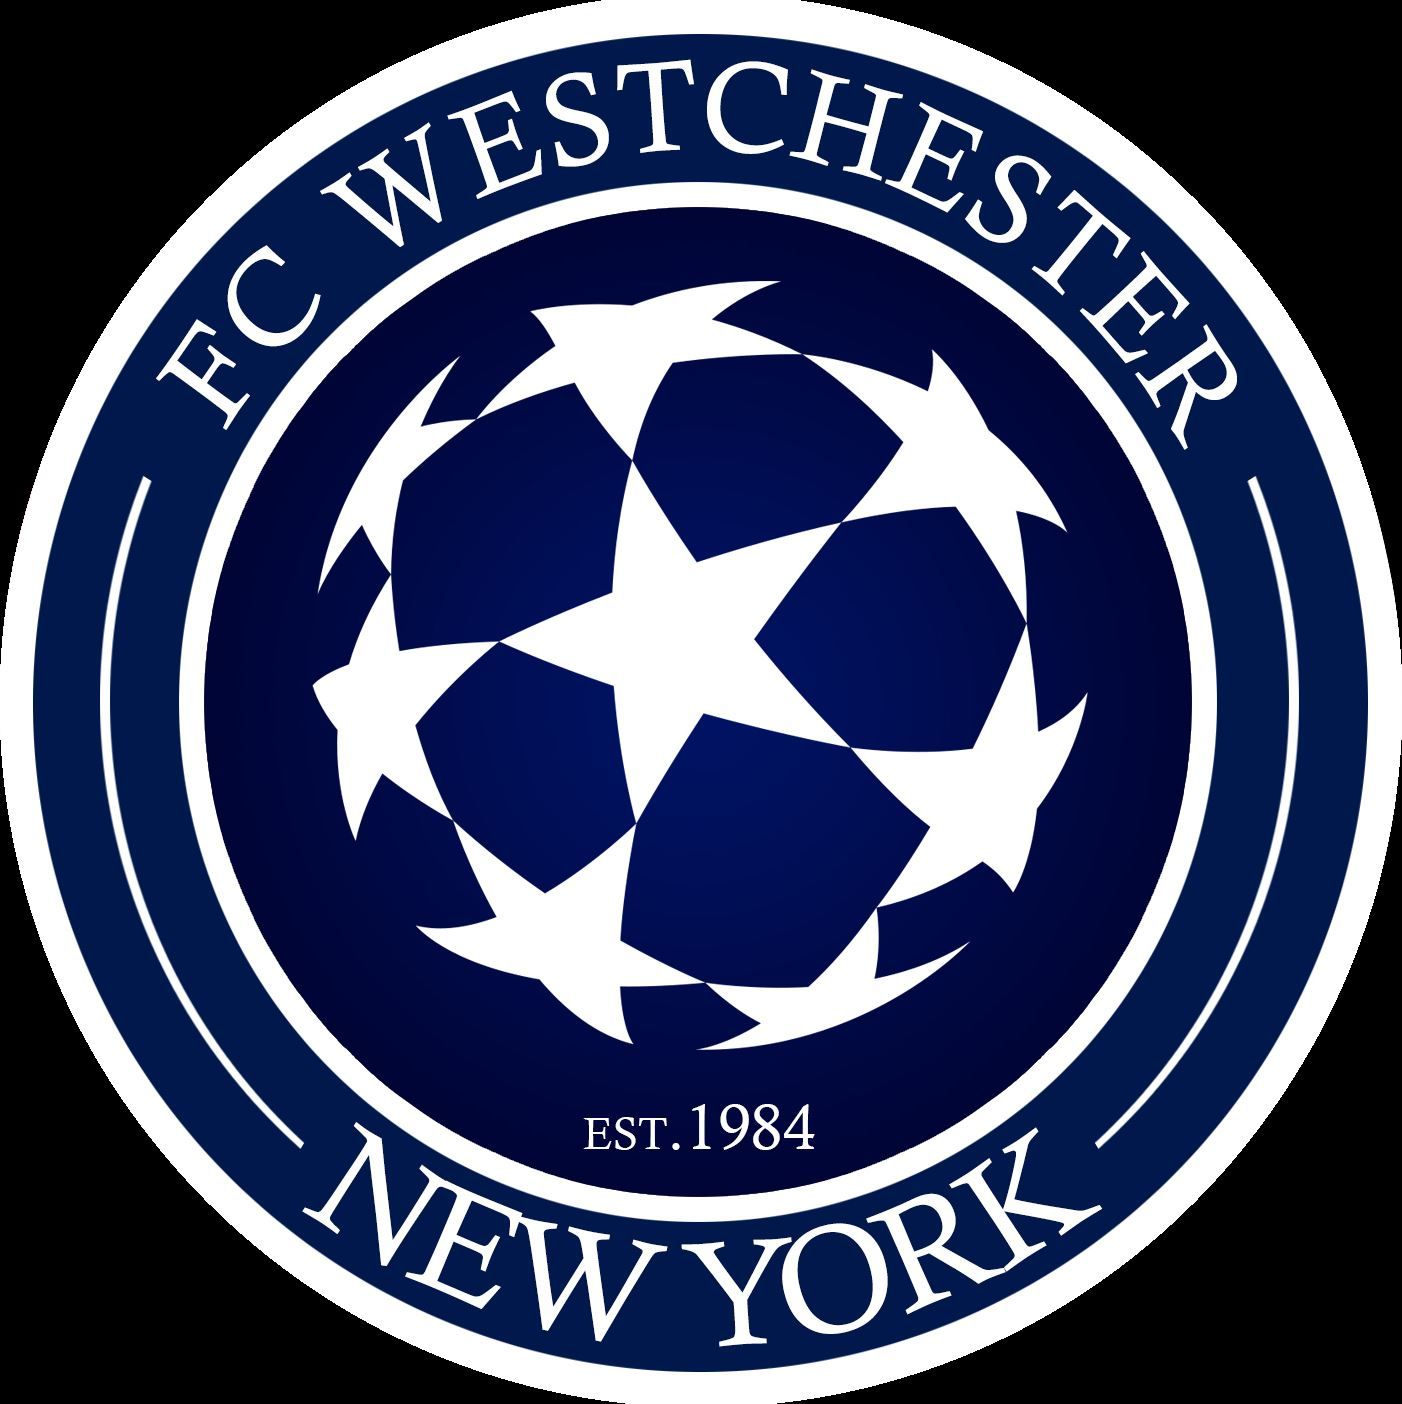 FC Westchester - FC Westchester 2001/2000 Academy